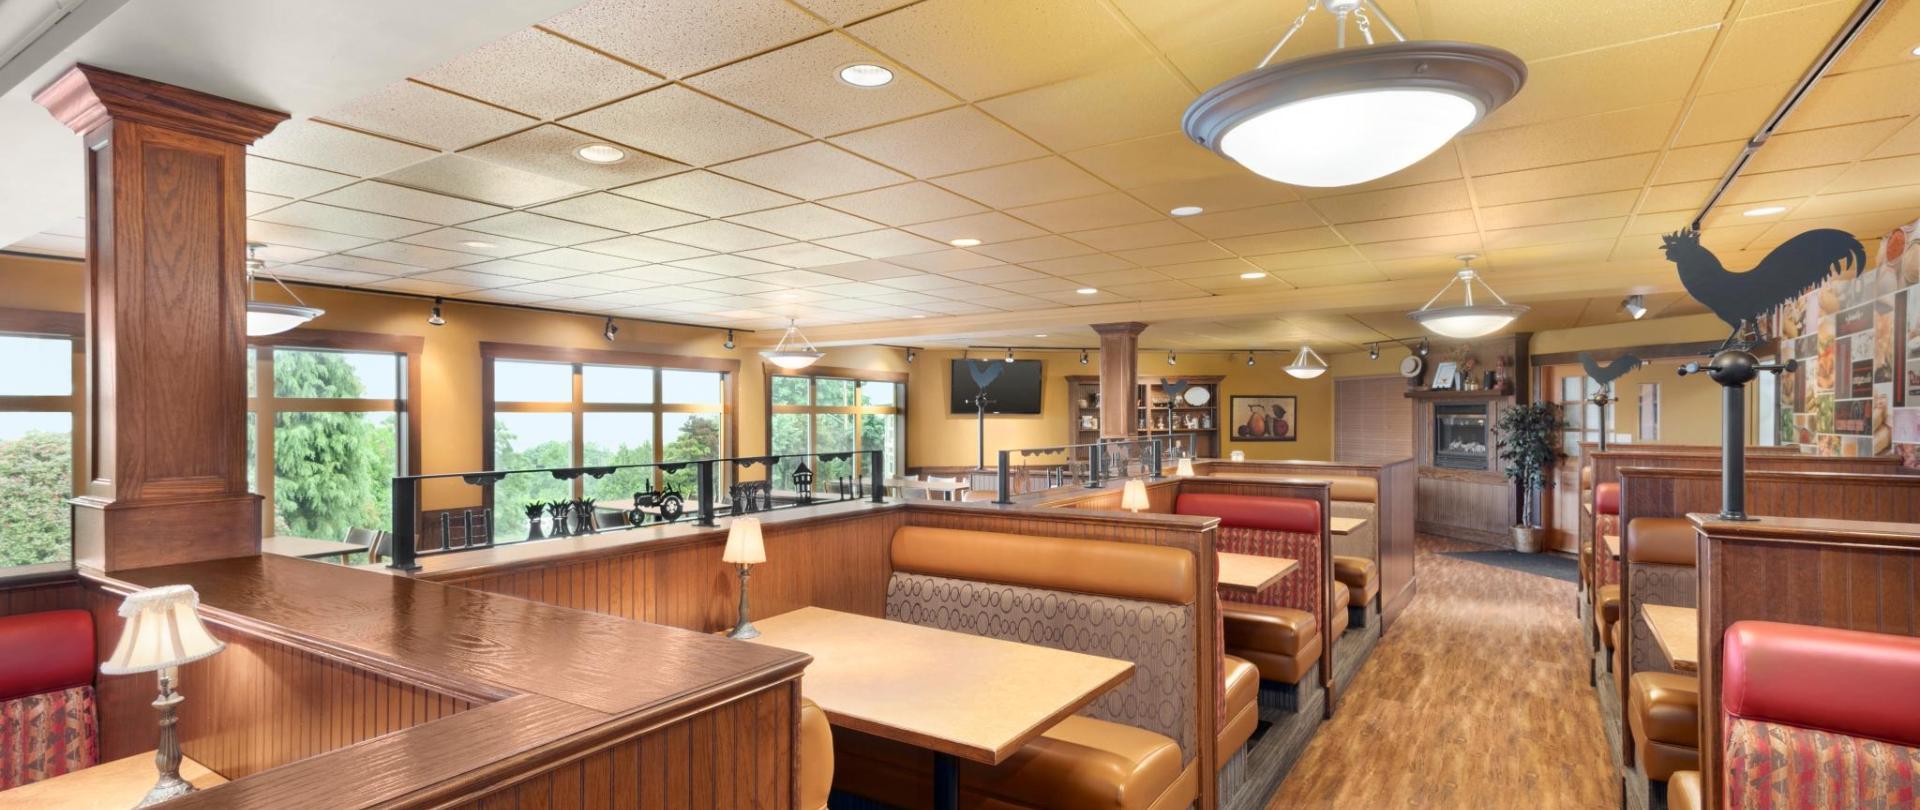 Days Inn Nanaimo - Ricky's Grill Restaurant - 1446740.jpg